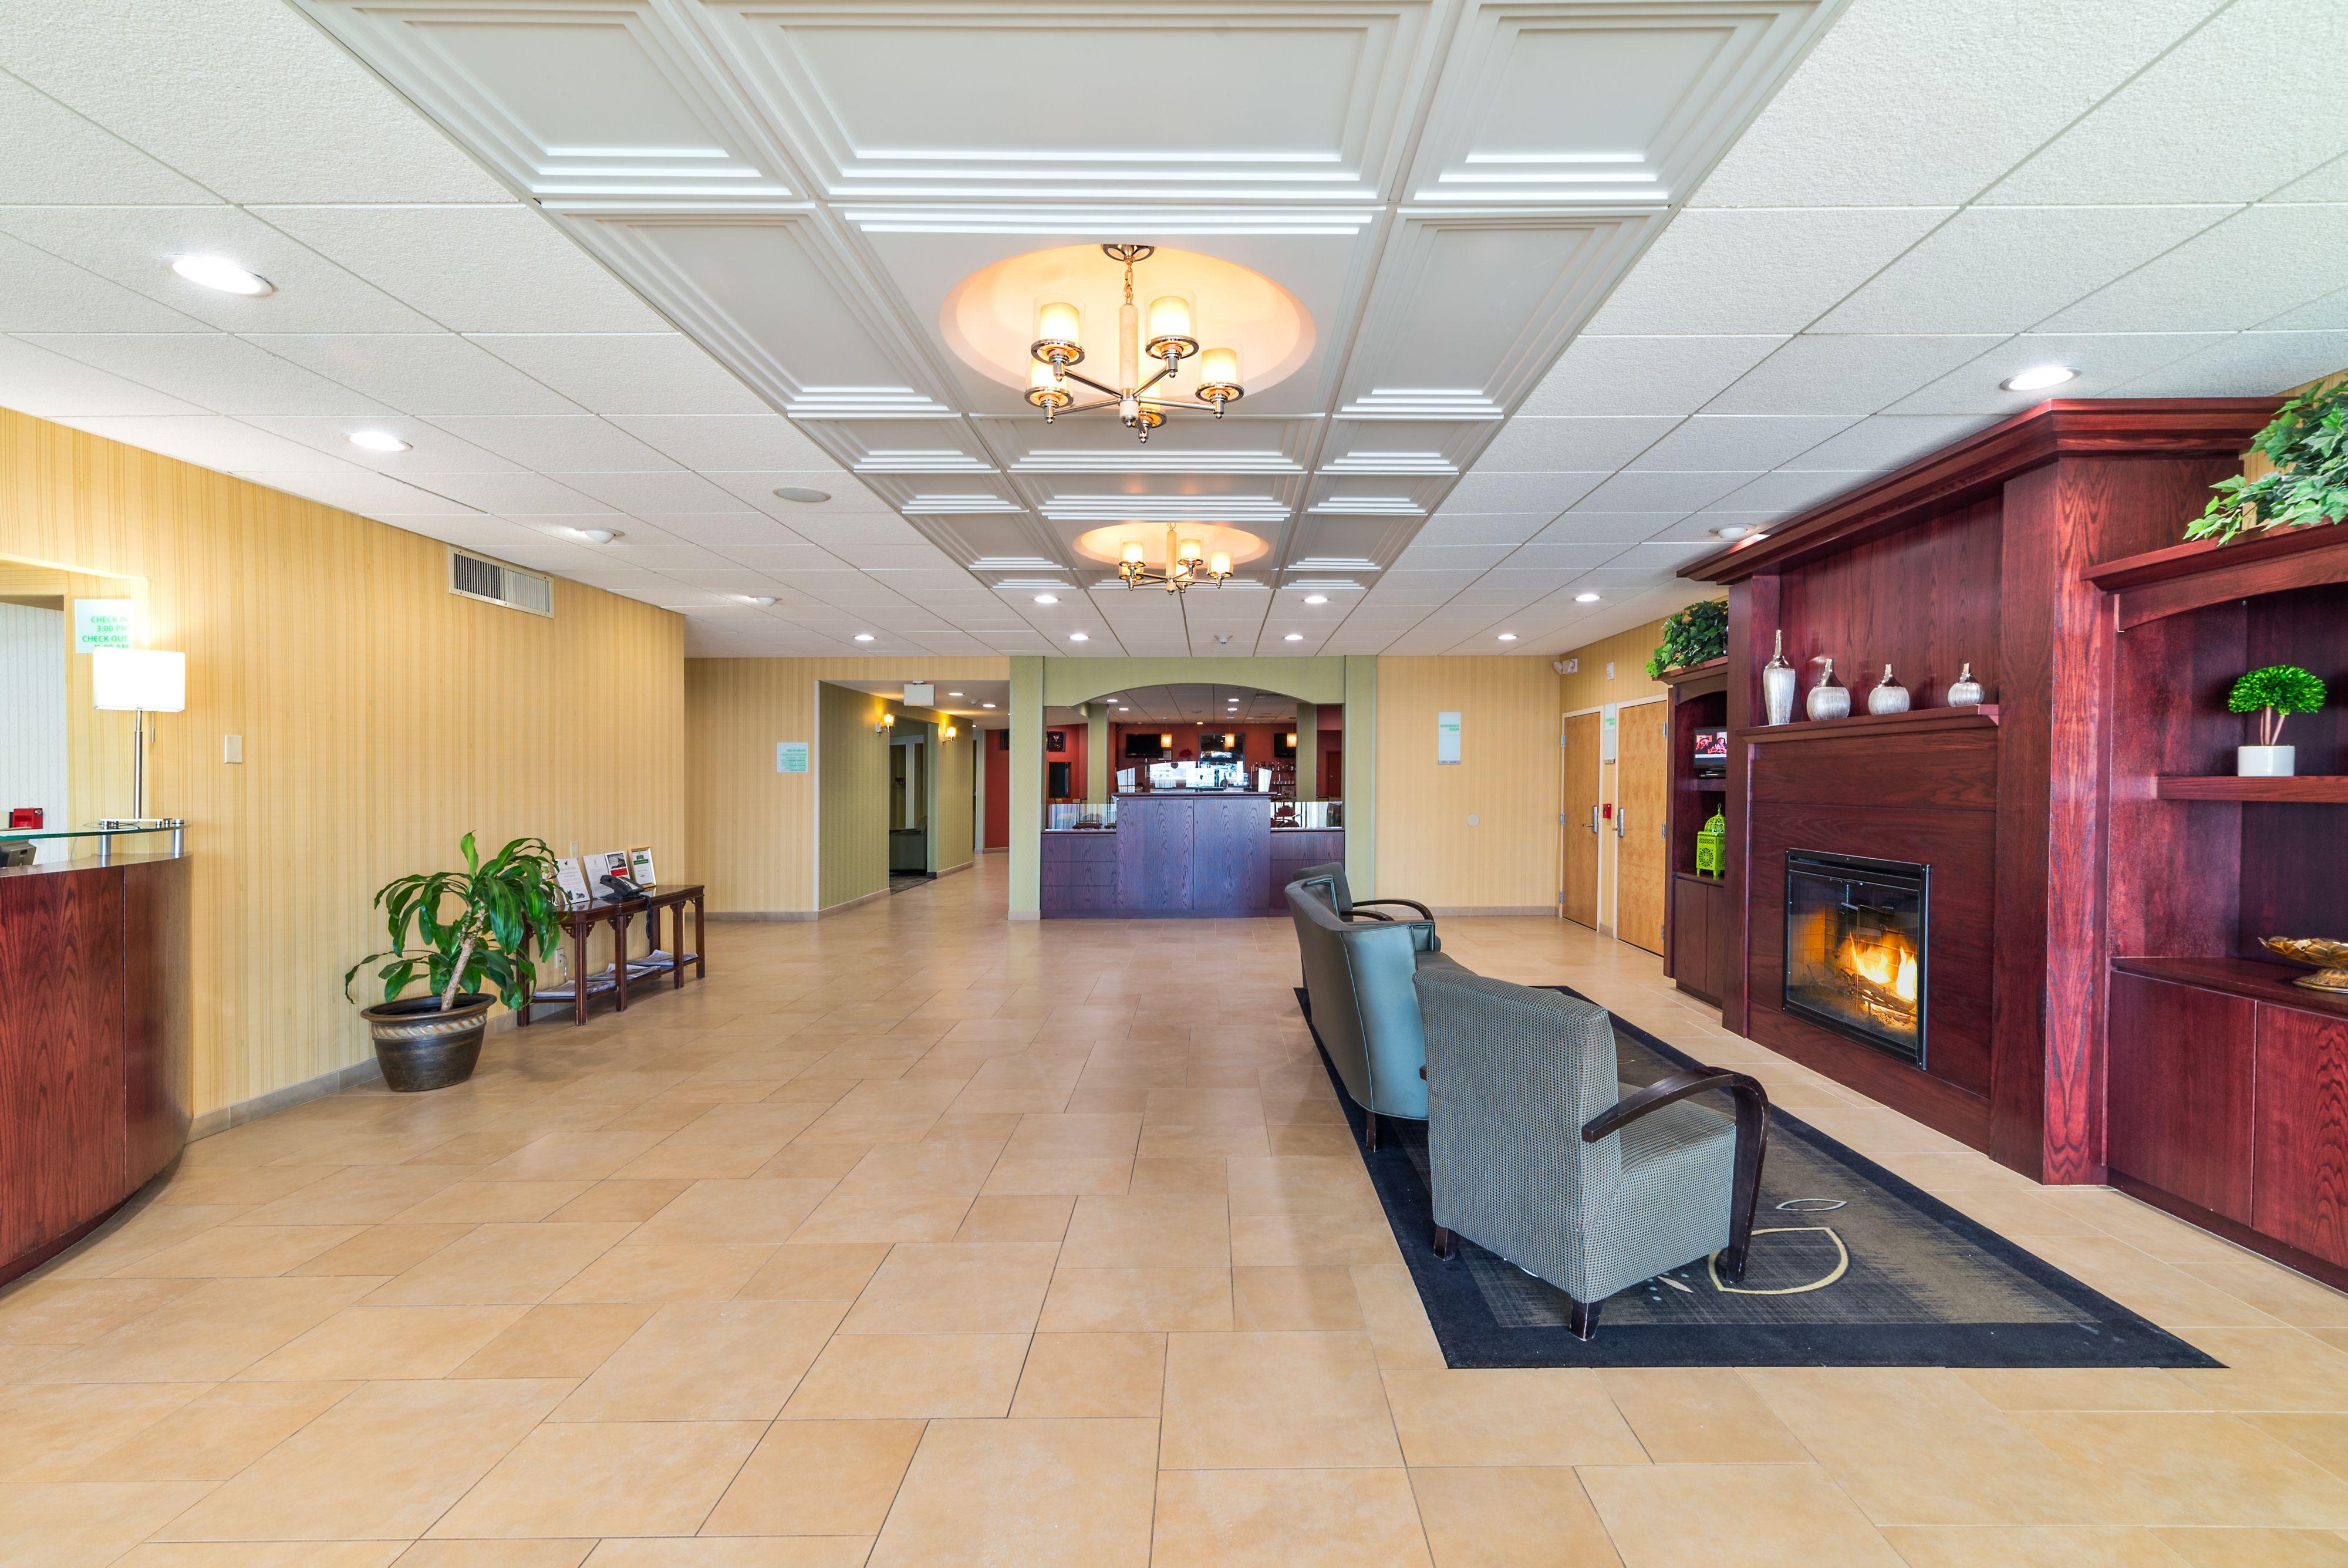 Holiday Inn Plattsburgh (Adirondack Area) image 4